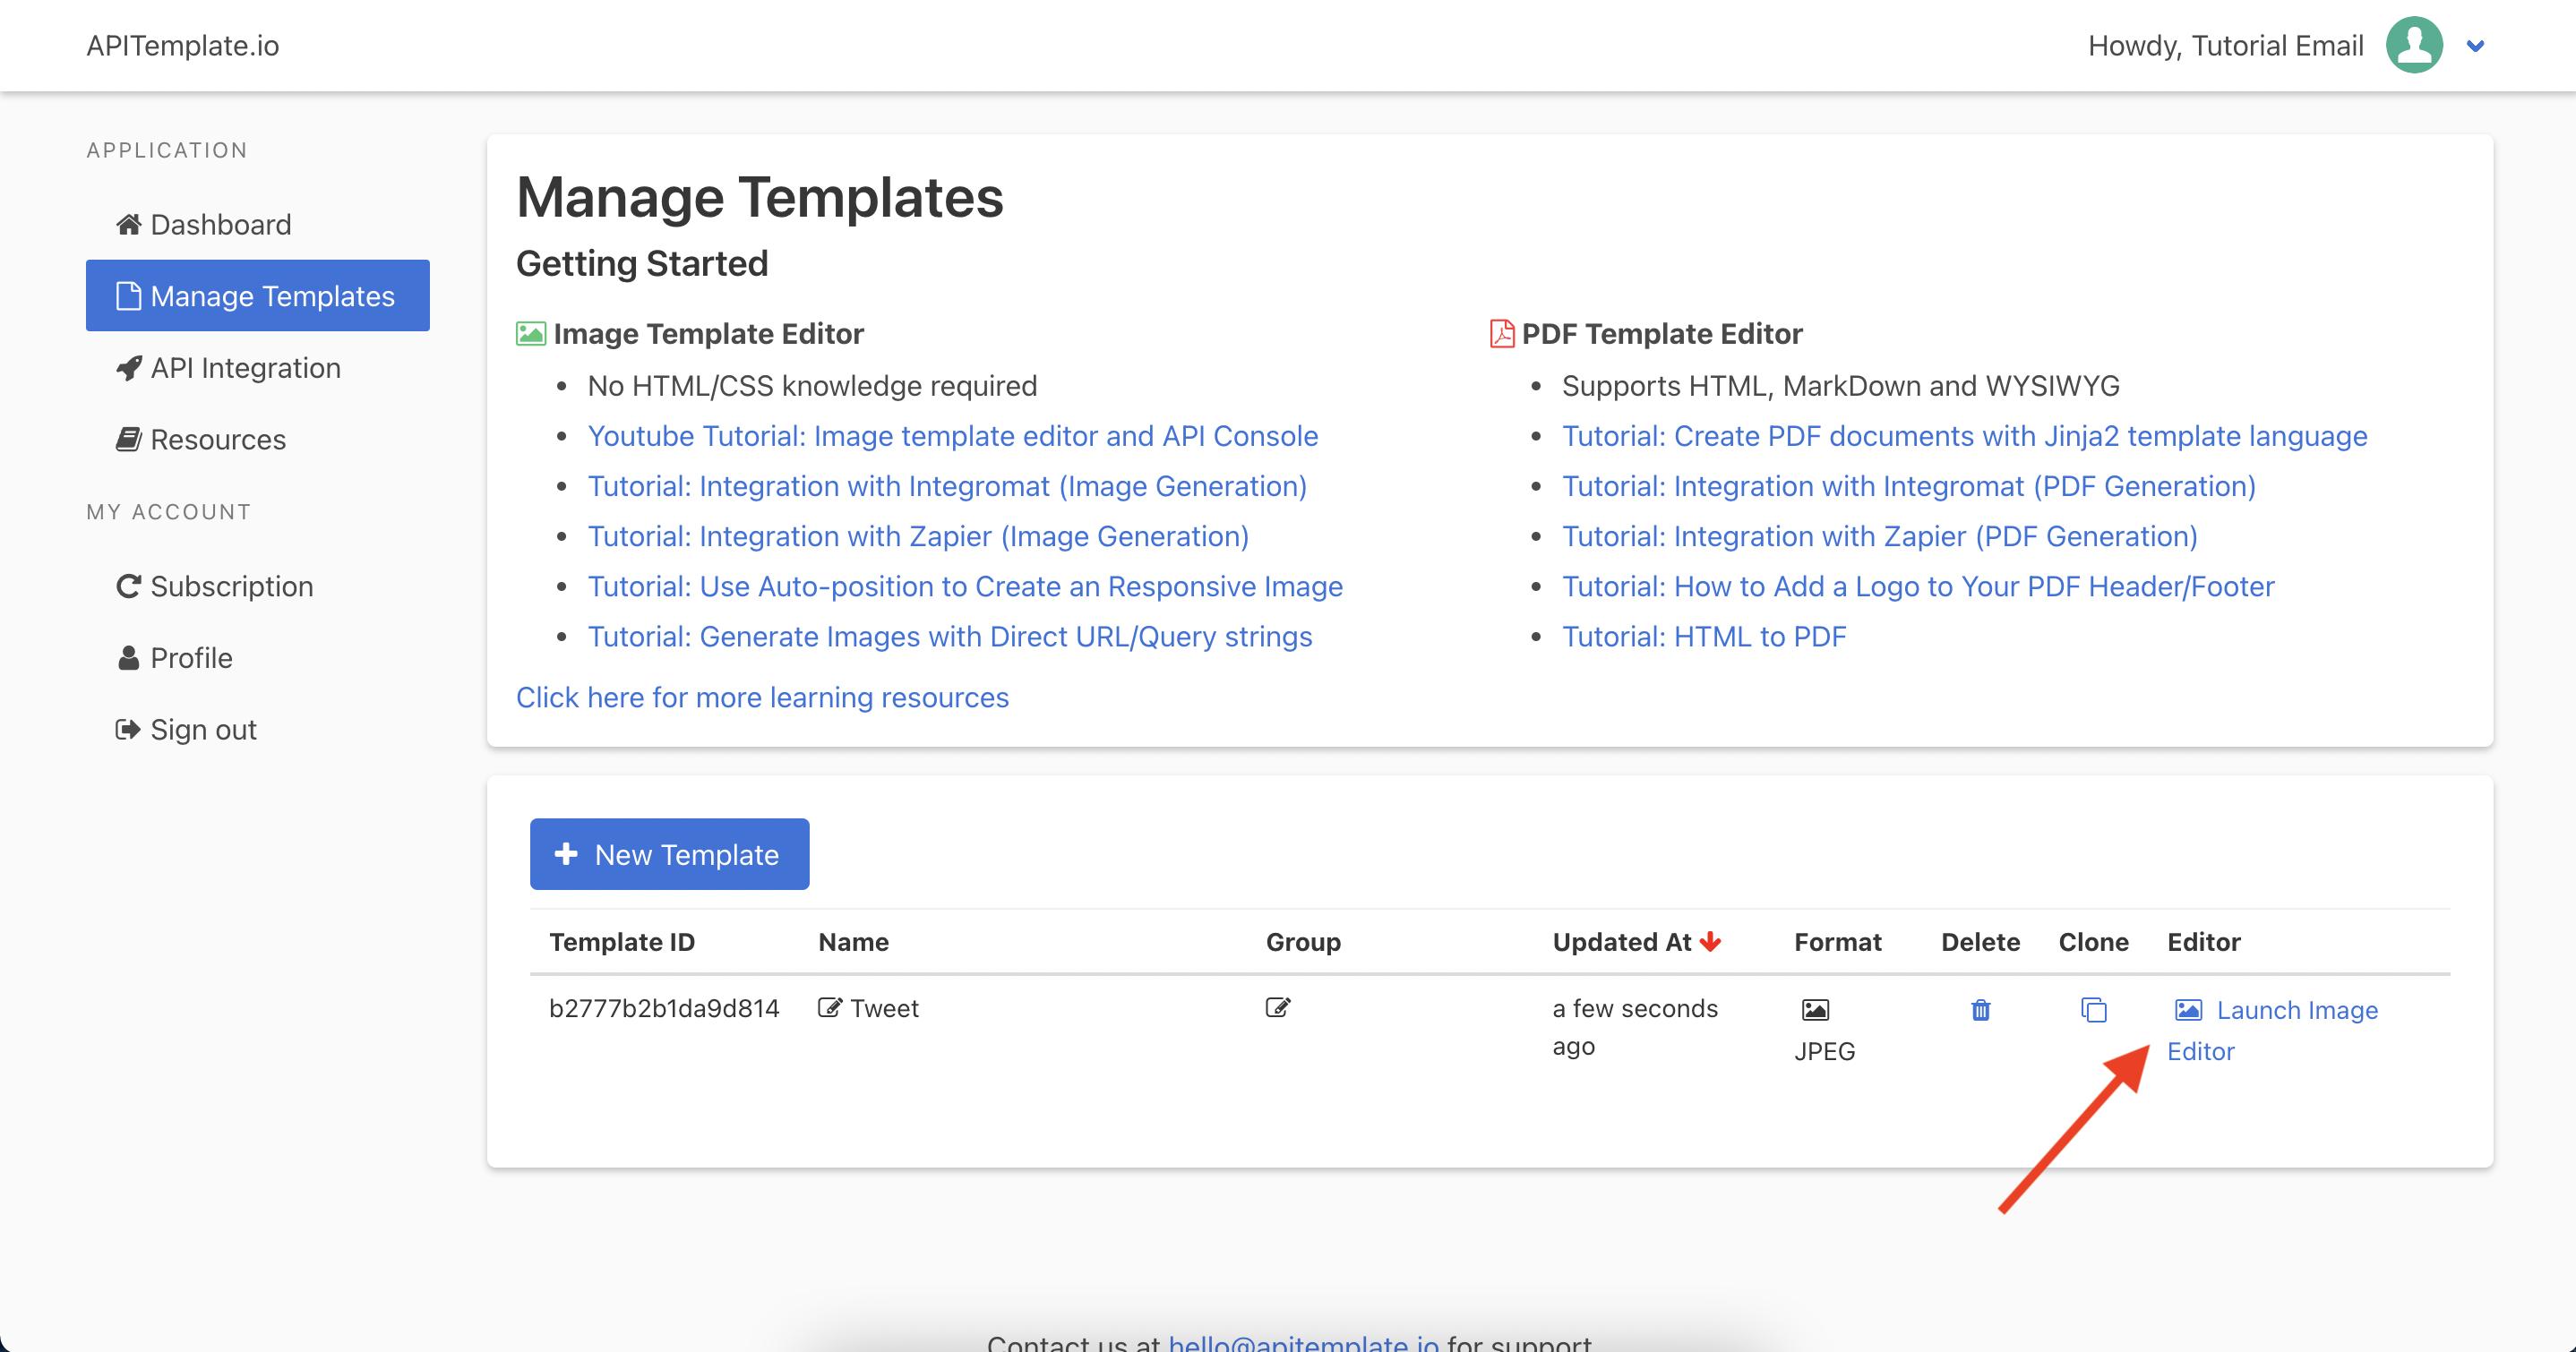 apitemplate-launch-image-editor